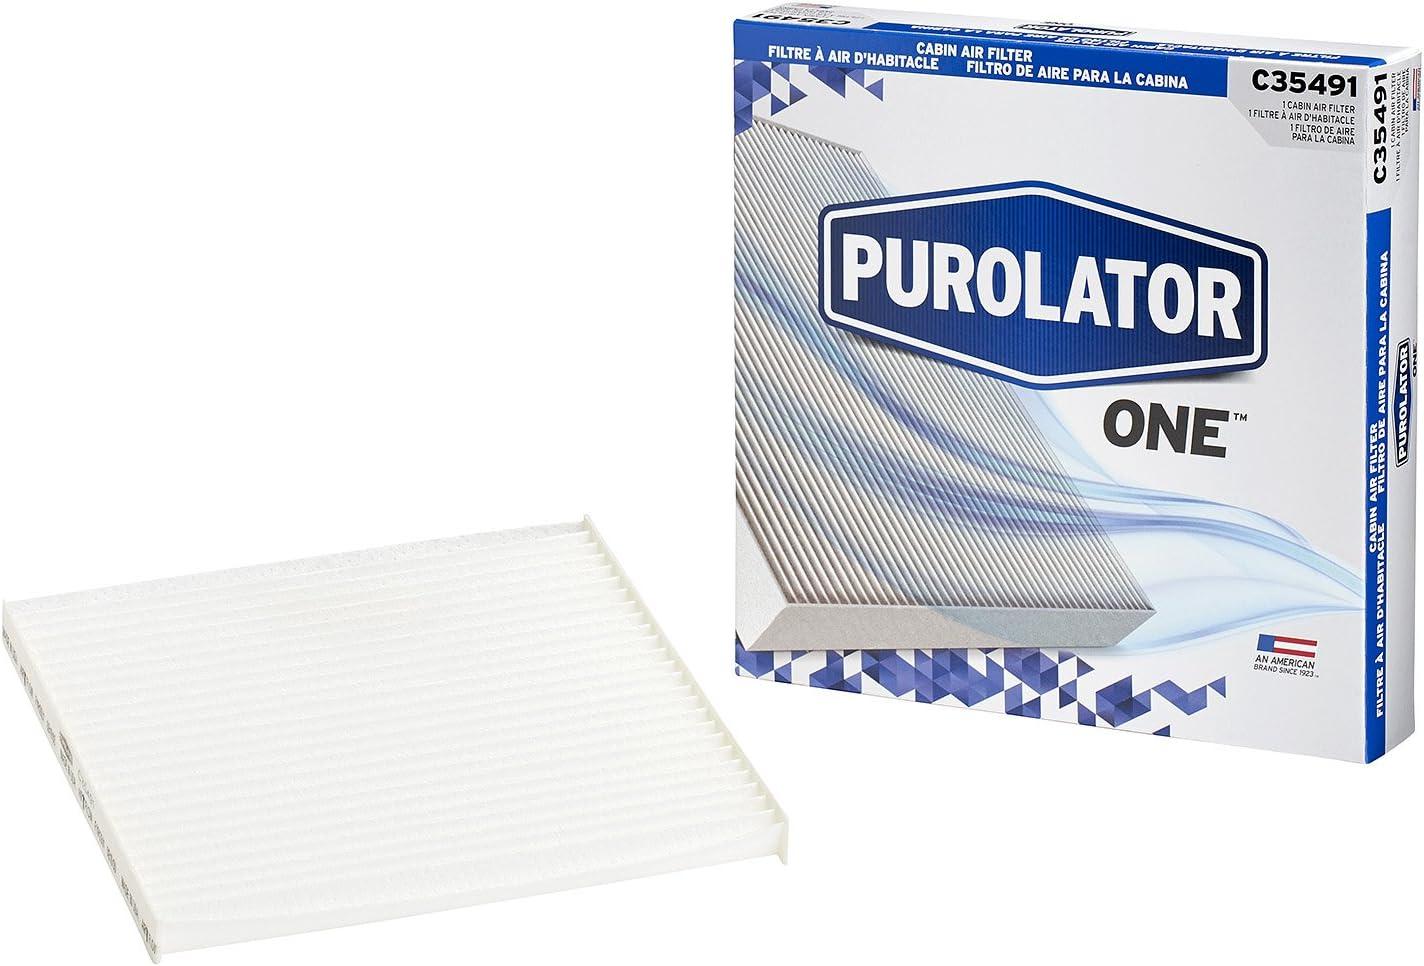 Purolator C35491 Single Cabin Air Filter